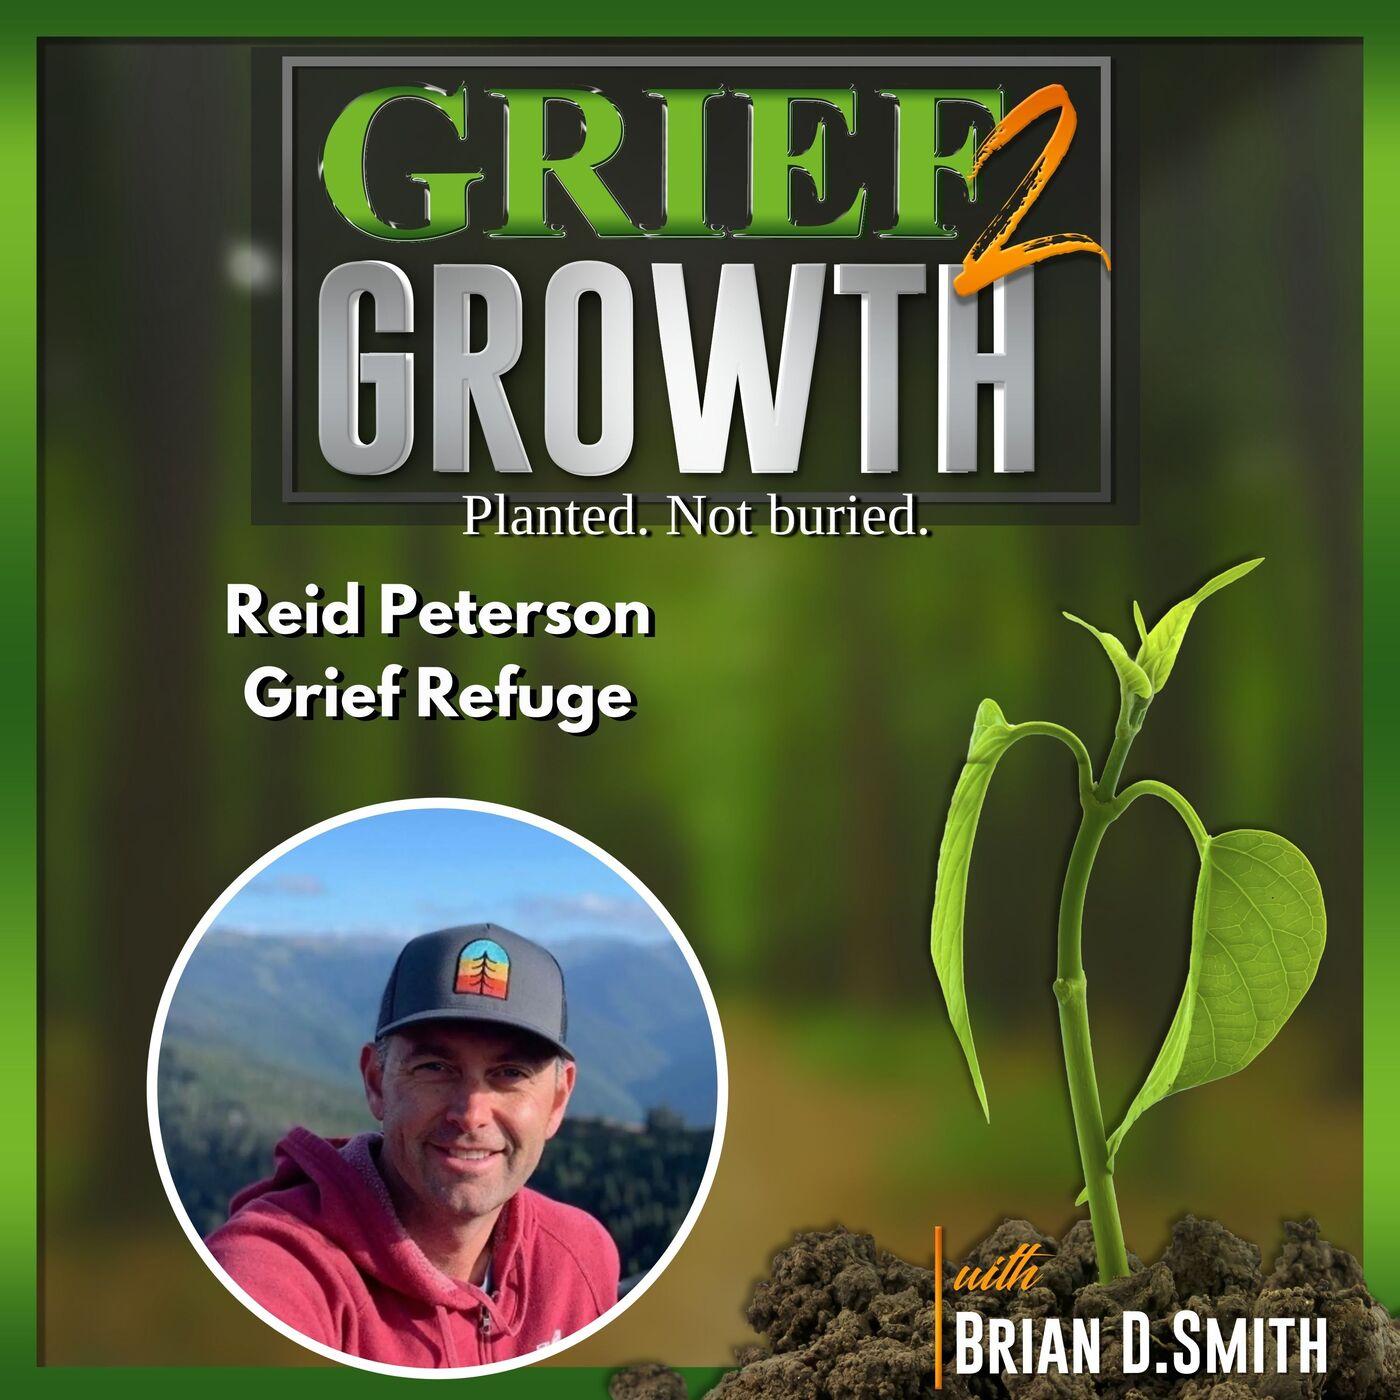 Reid Peterson- Grief Refuge